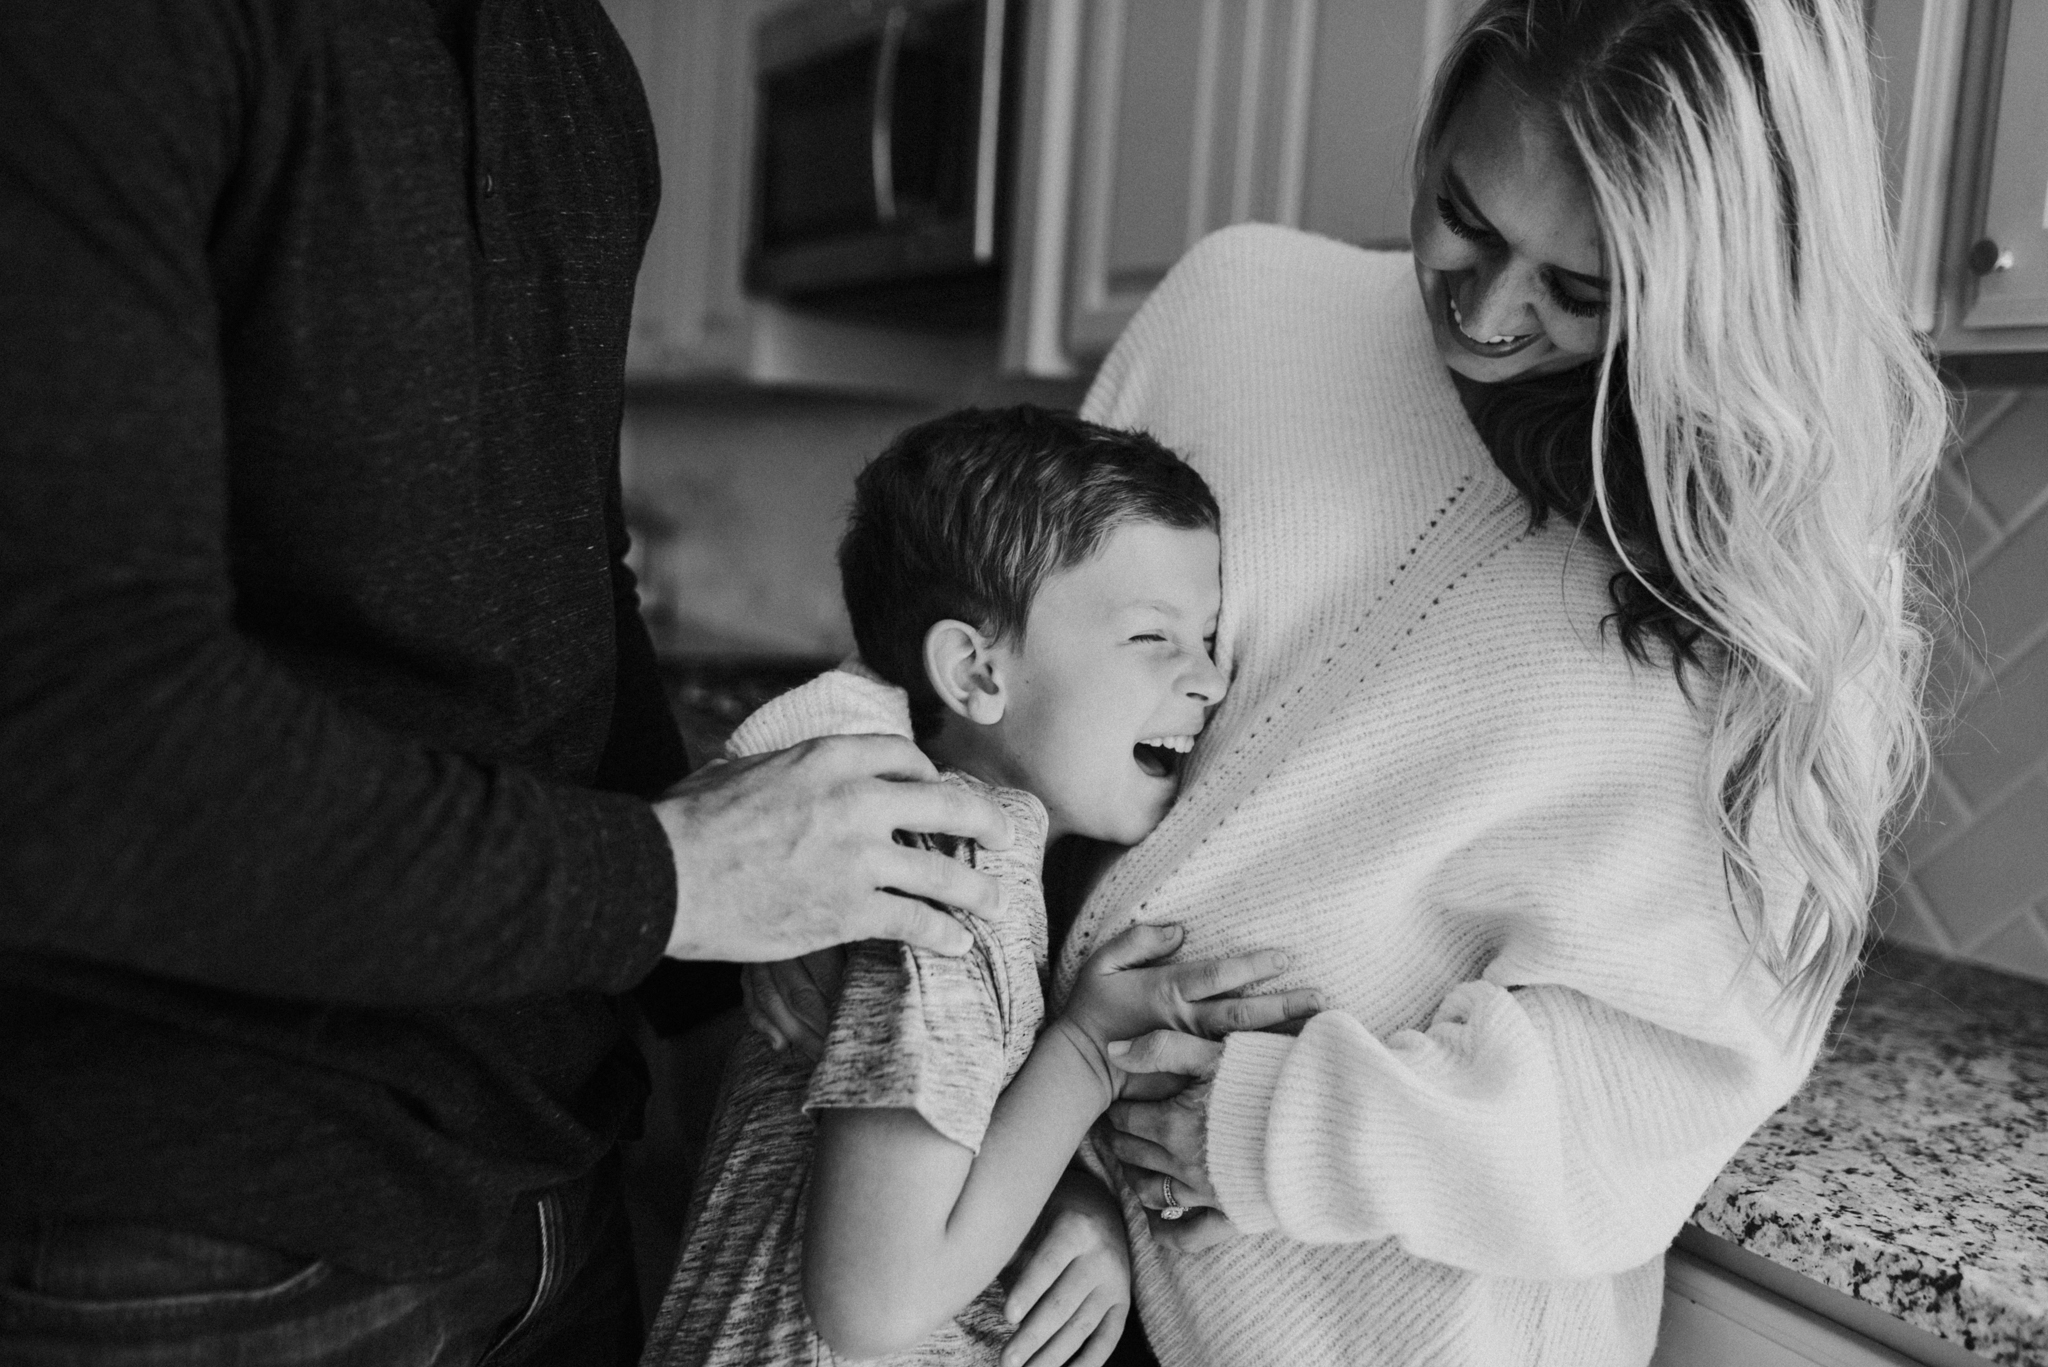 houston-wedding-photographer-in-home-maternity-session-puppies- Houston Wedding Photographer -Kristen Giles Photography-27.jpg